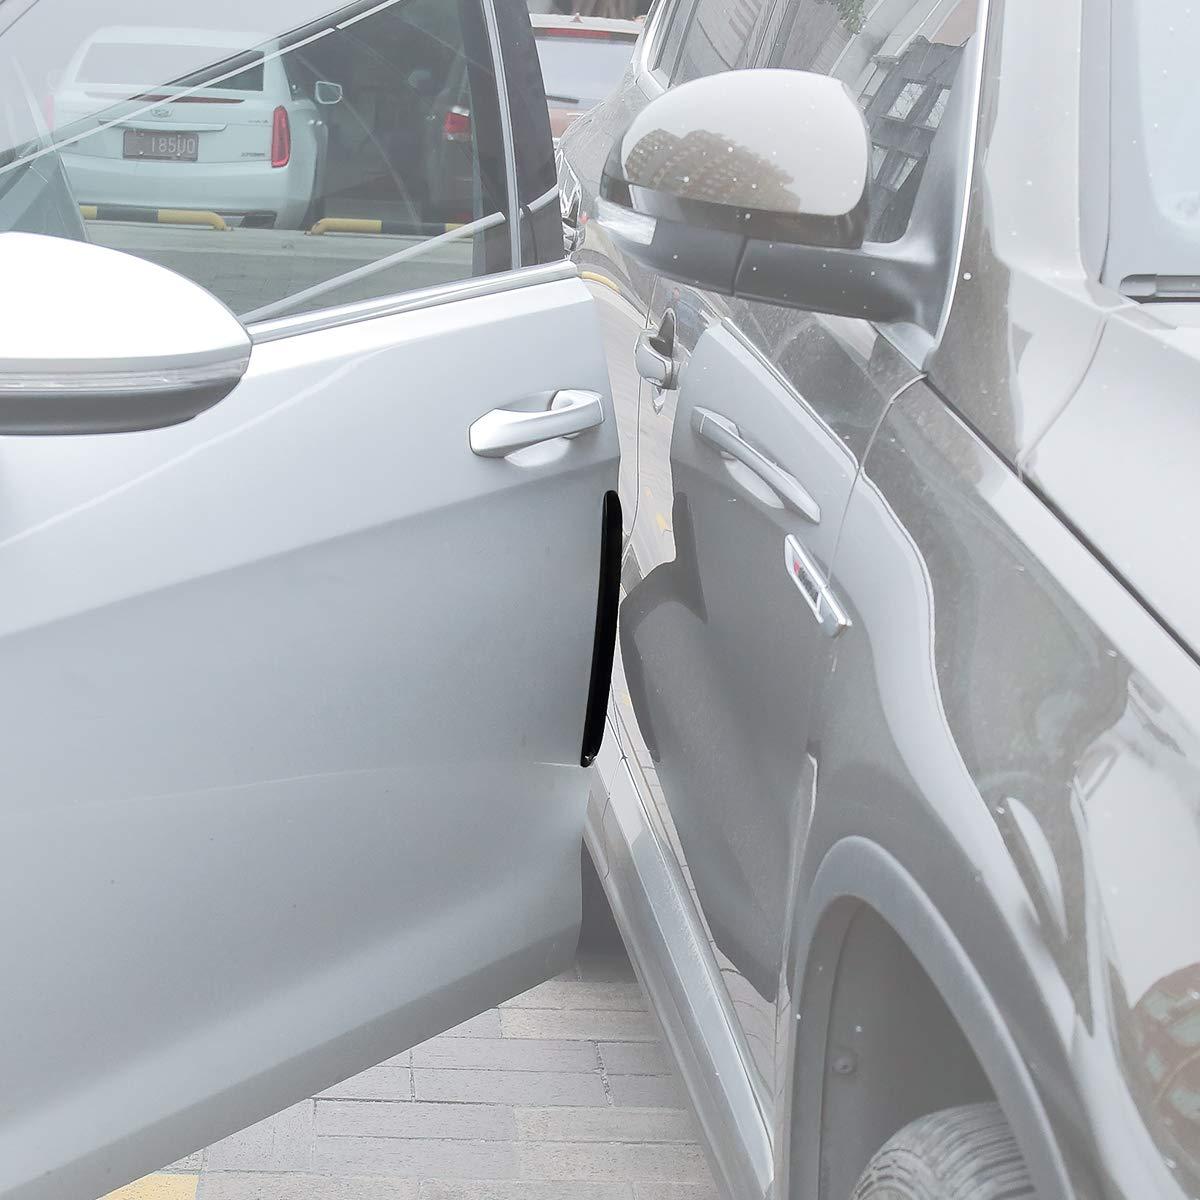 Bumper Protector Car Door Edge Guard 5D Carbon Fiber Wrap Film Waterproof Anti-Collision Strip for Car Door Guard//Front and Rear Bumper//Door Sill Protector 1.18in393in